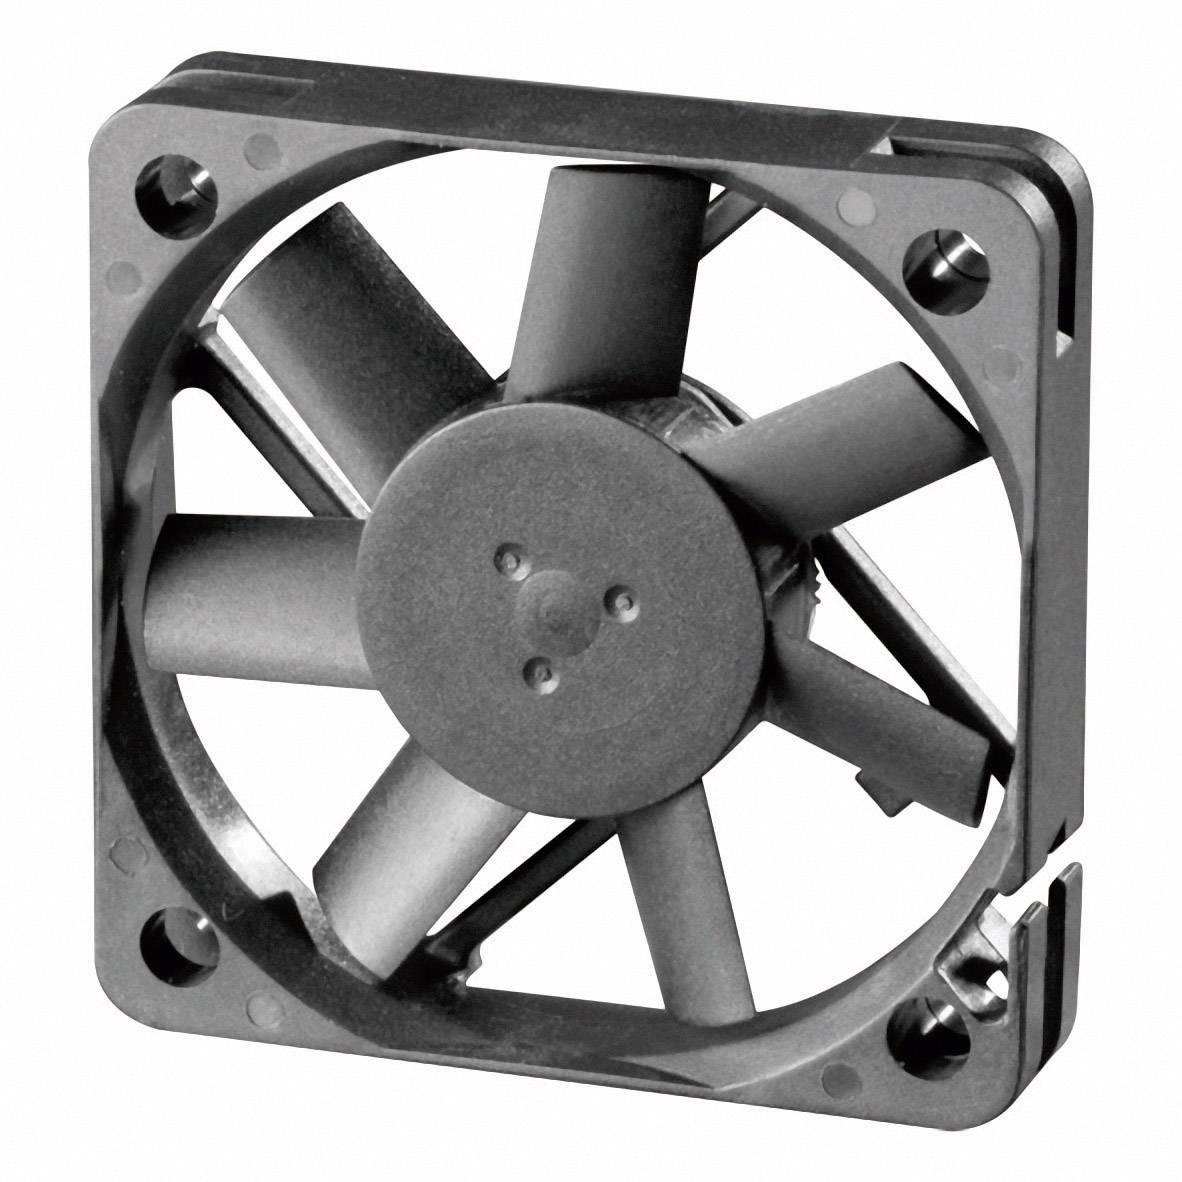 Axiálny ventilátor Sunon EB60251S1-000U-999 EB60251S1-000U-999, 12 V/DC, 33.5 dB, (d x š x v) 60 x 60 x 25 mm